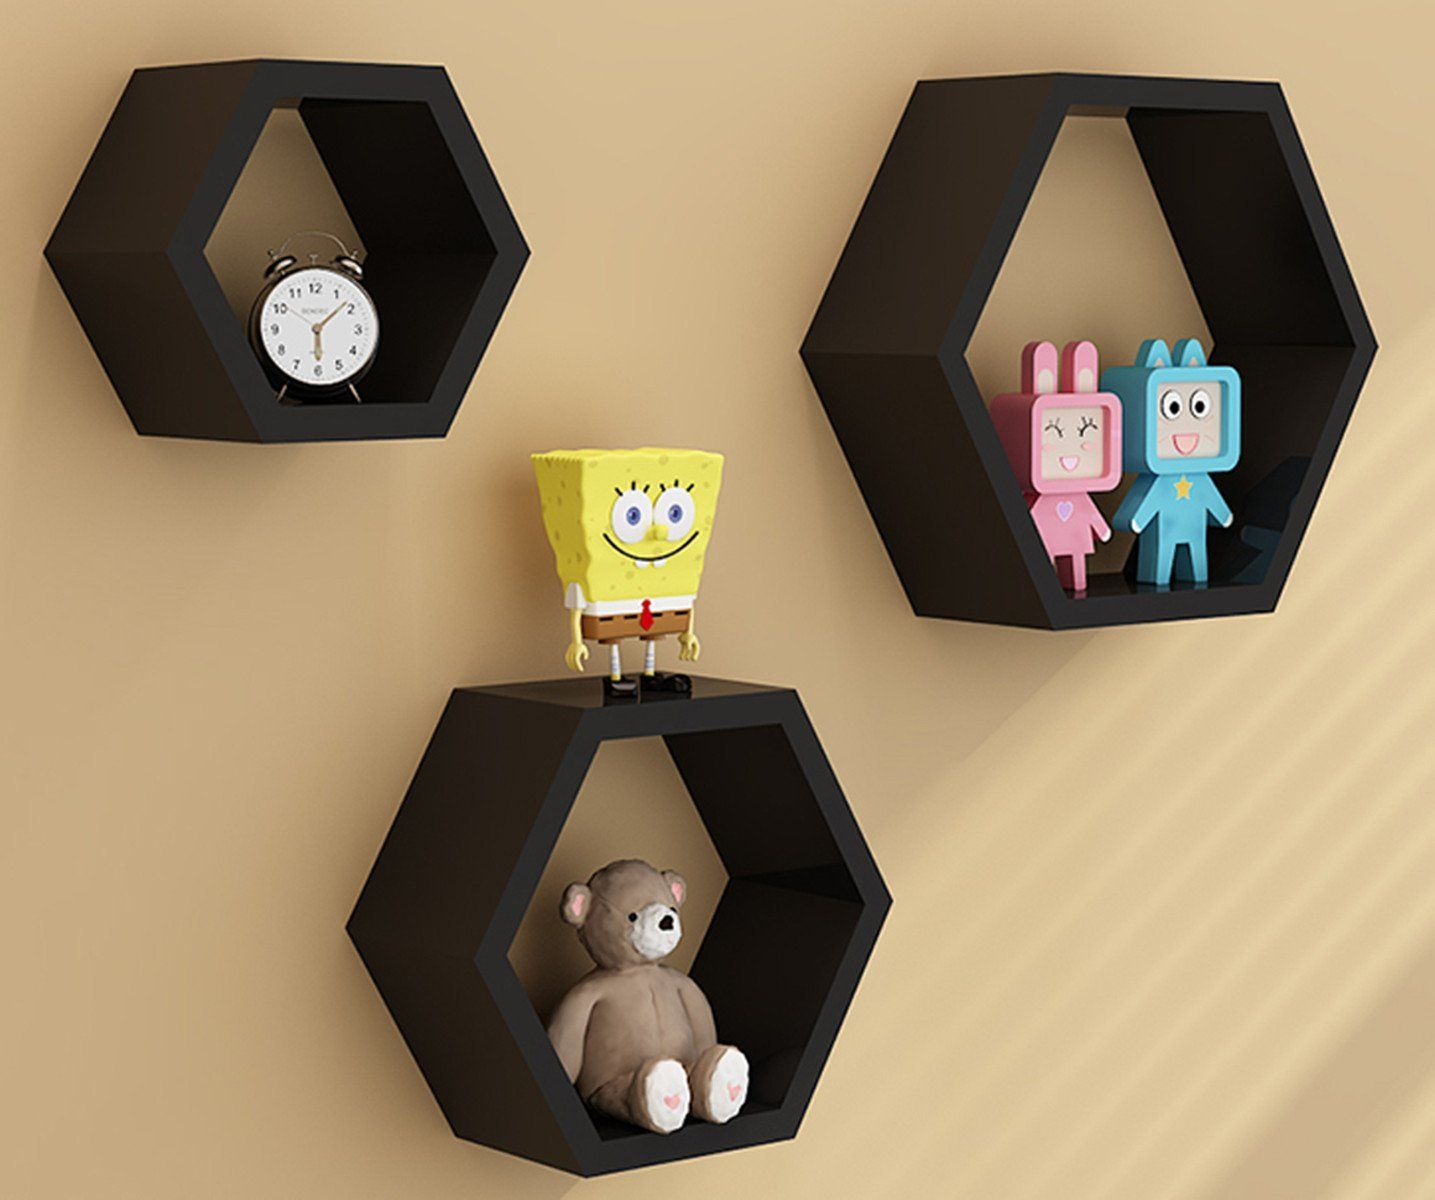 Amazon.com - Zjchao Home DIY Decorative Wall Floating Honeycomb ...